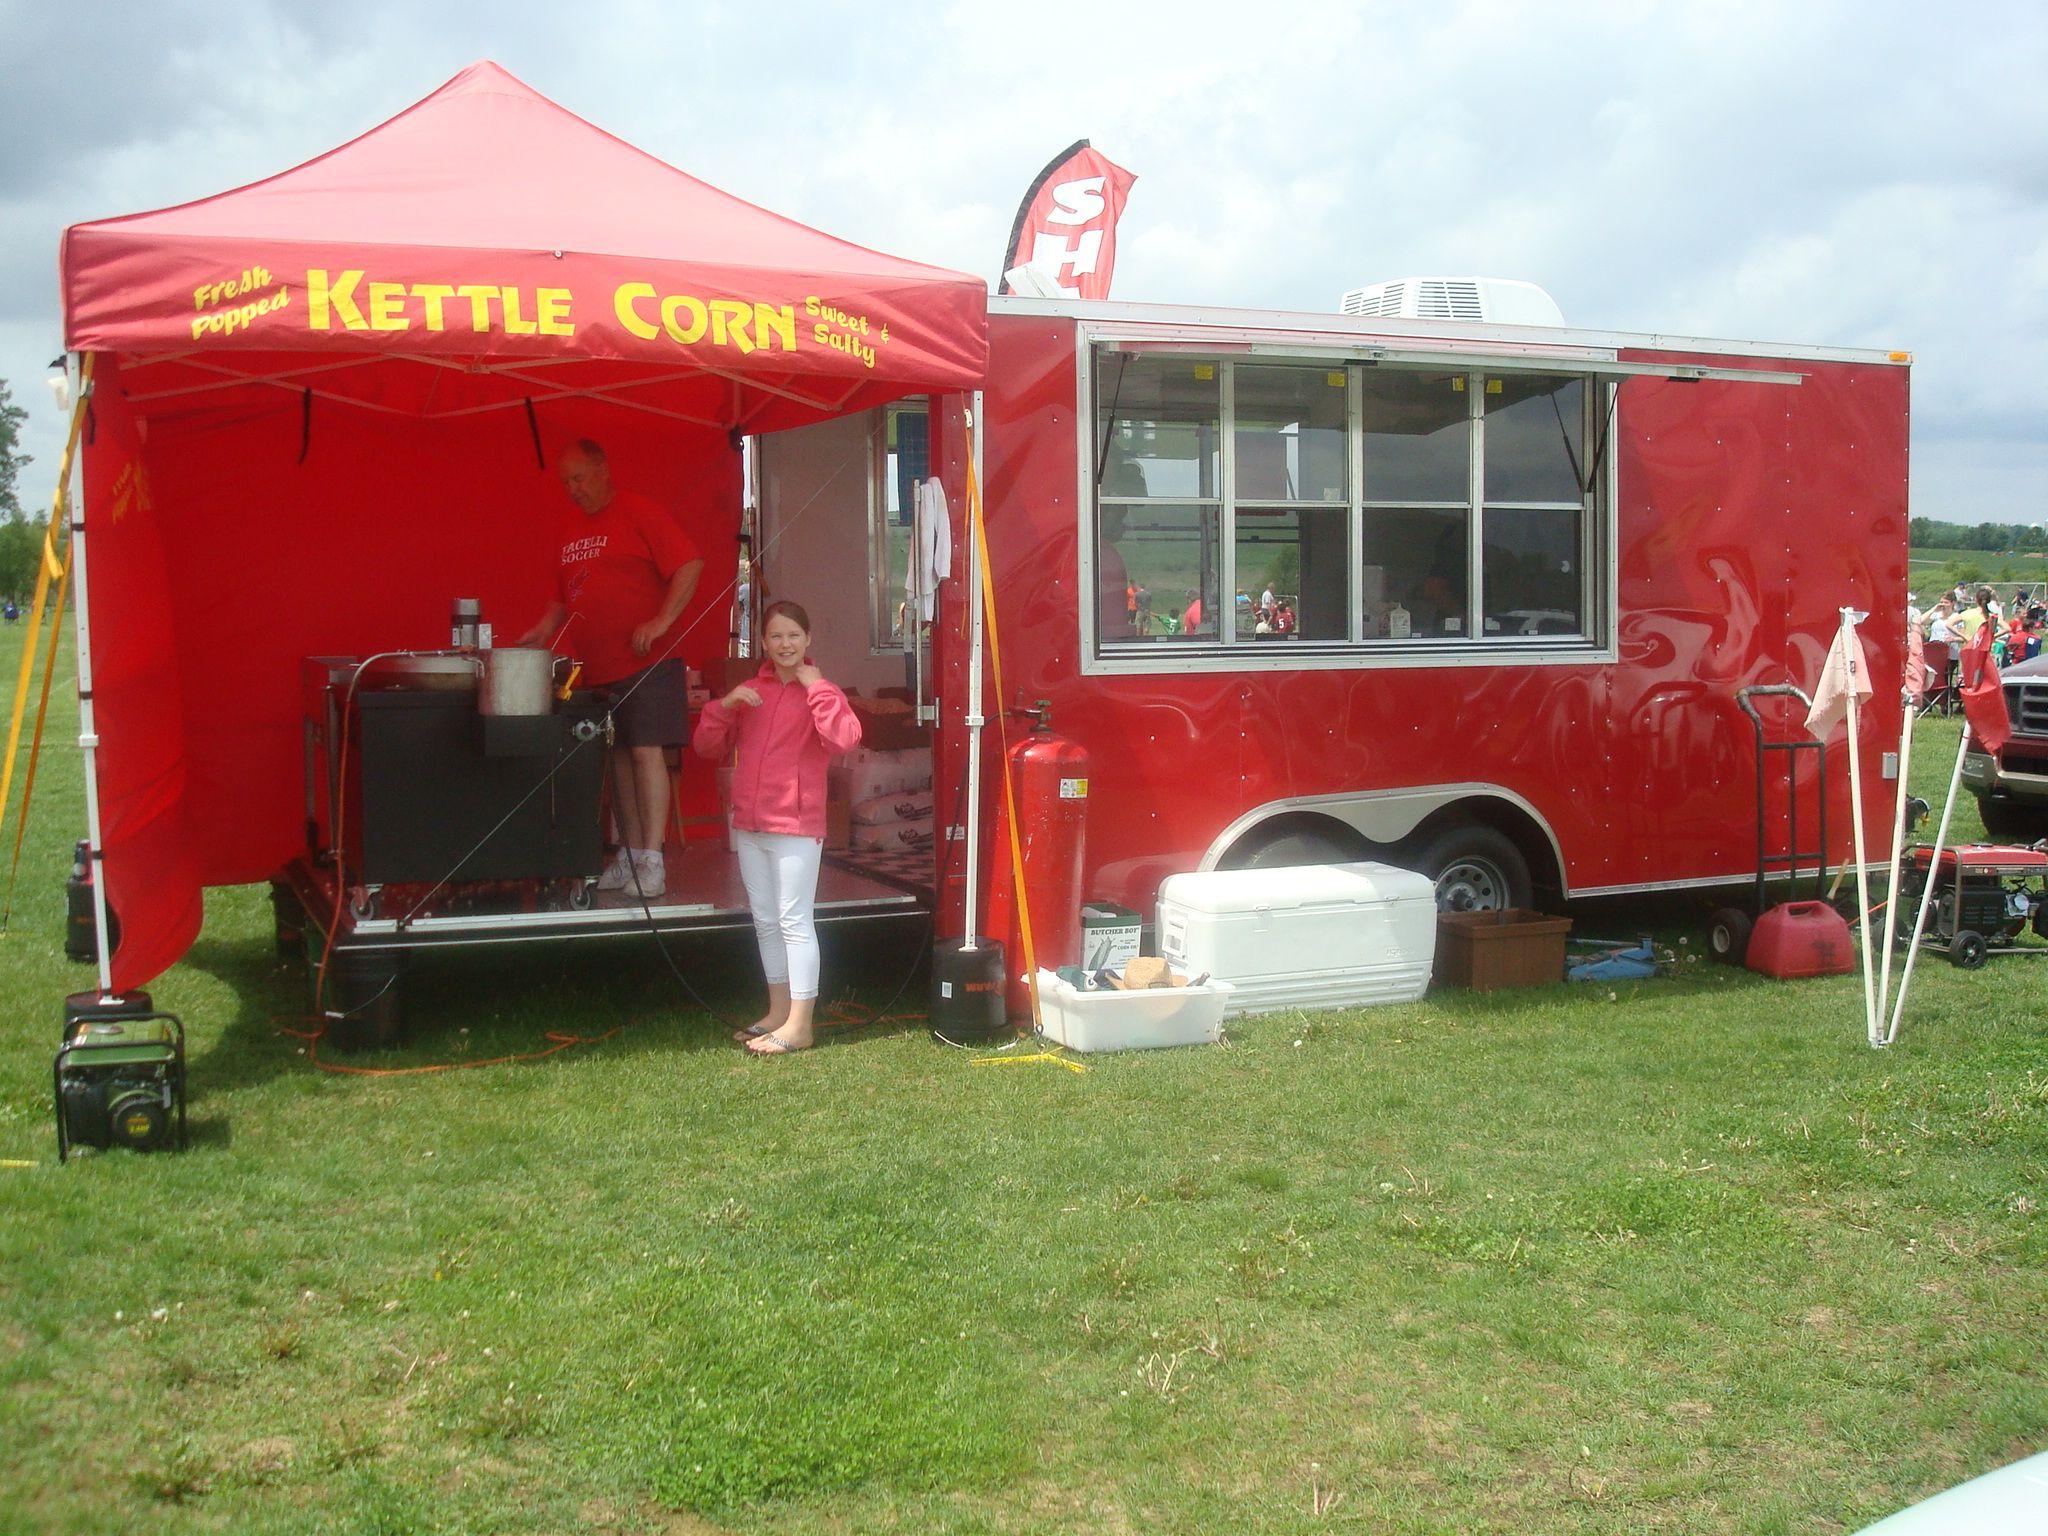 Kettle Corn Wisconsin The Flying Kettle Funnel Cakes Vendor